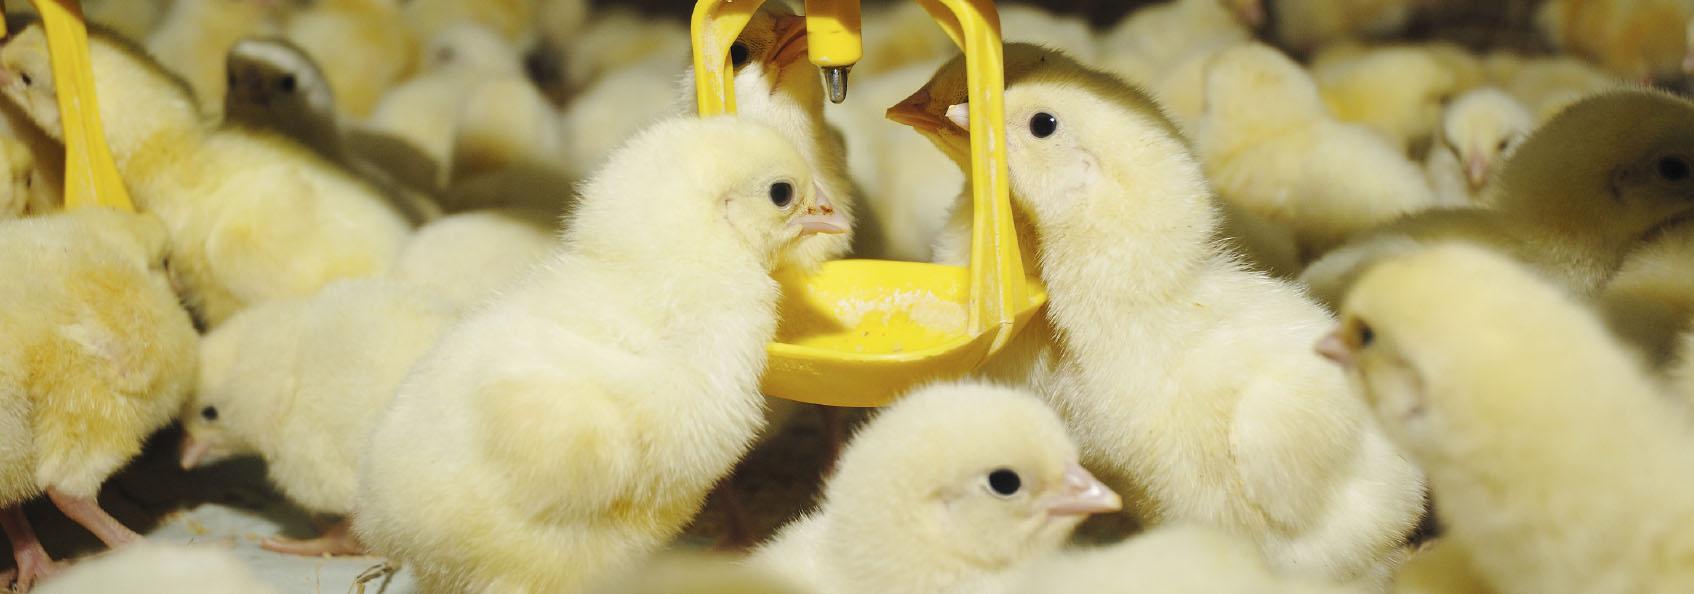 Image-4-Chicks